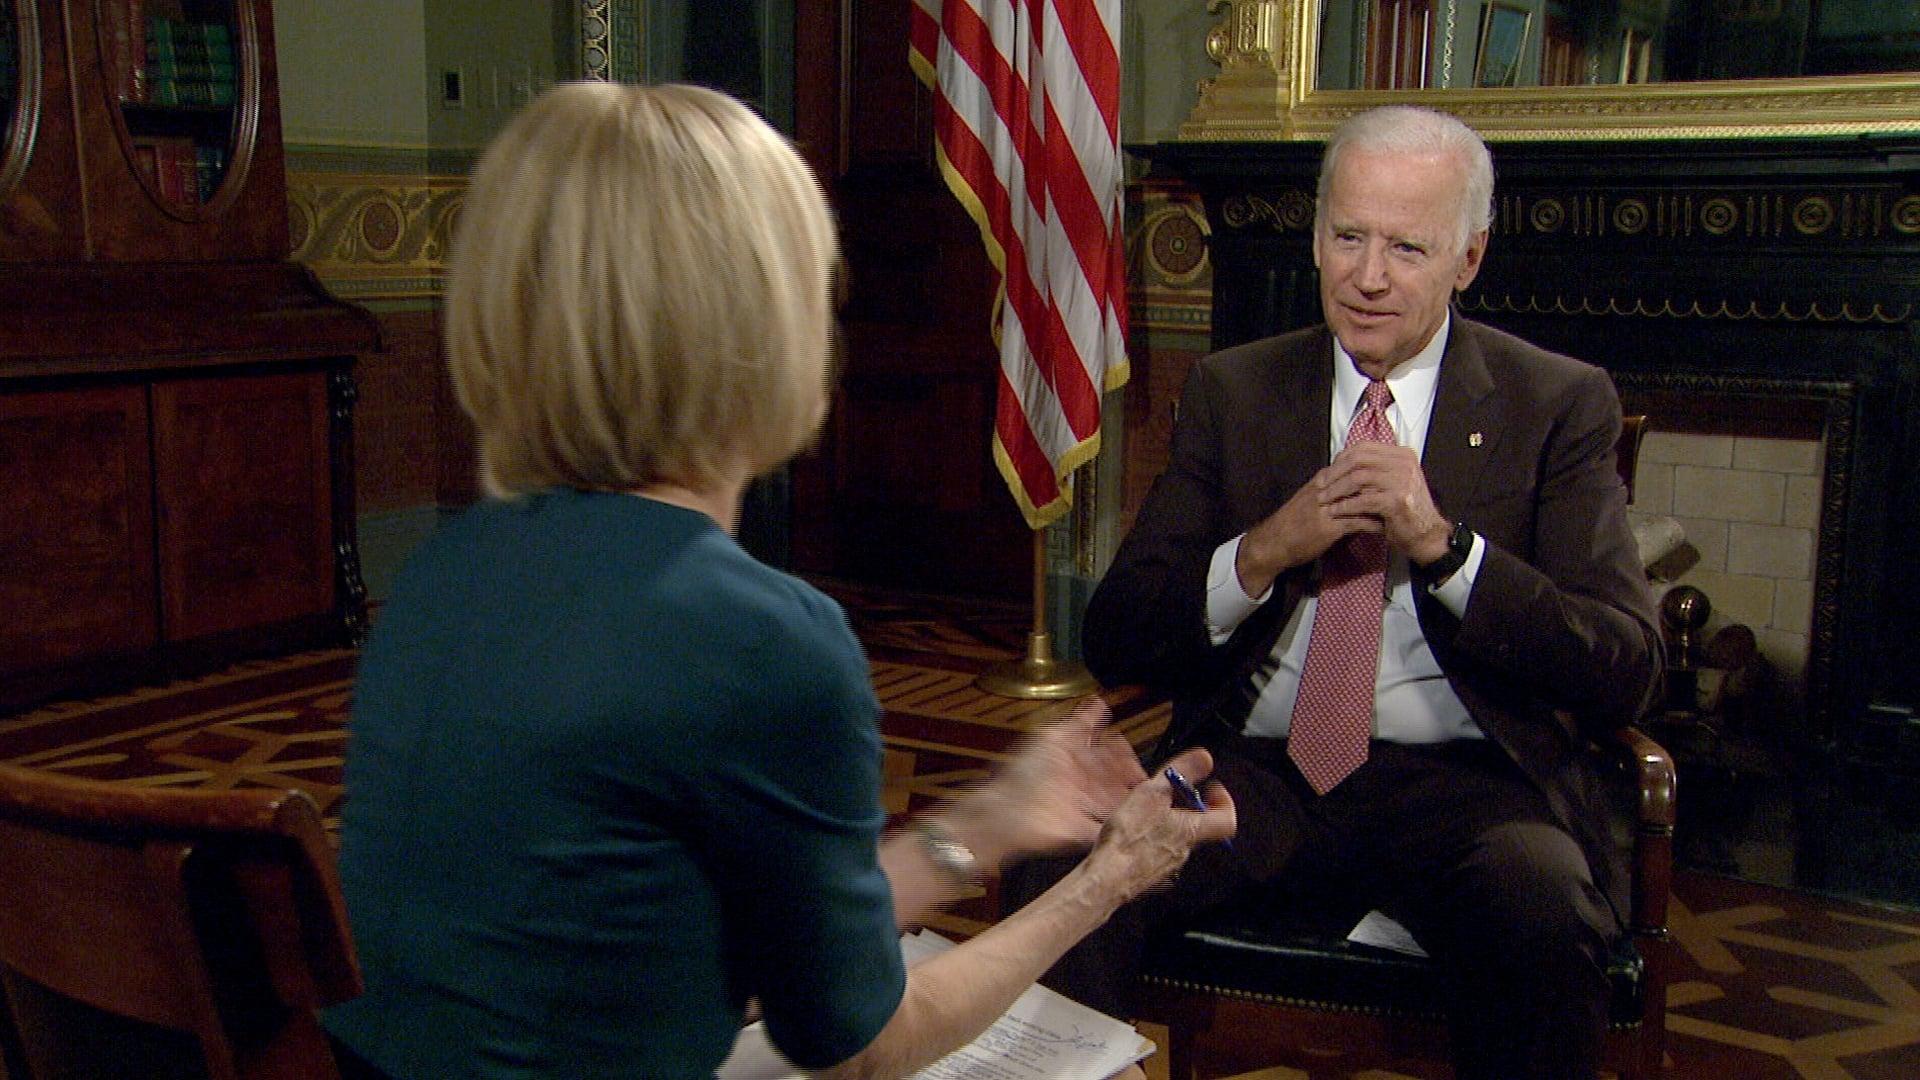 PBS NewsHour Season 42 :Episode 4  January 5, 2017